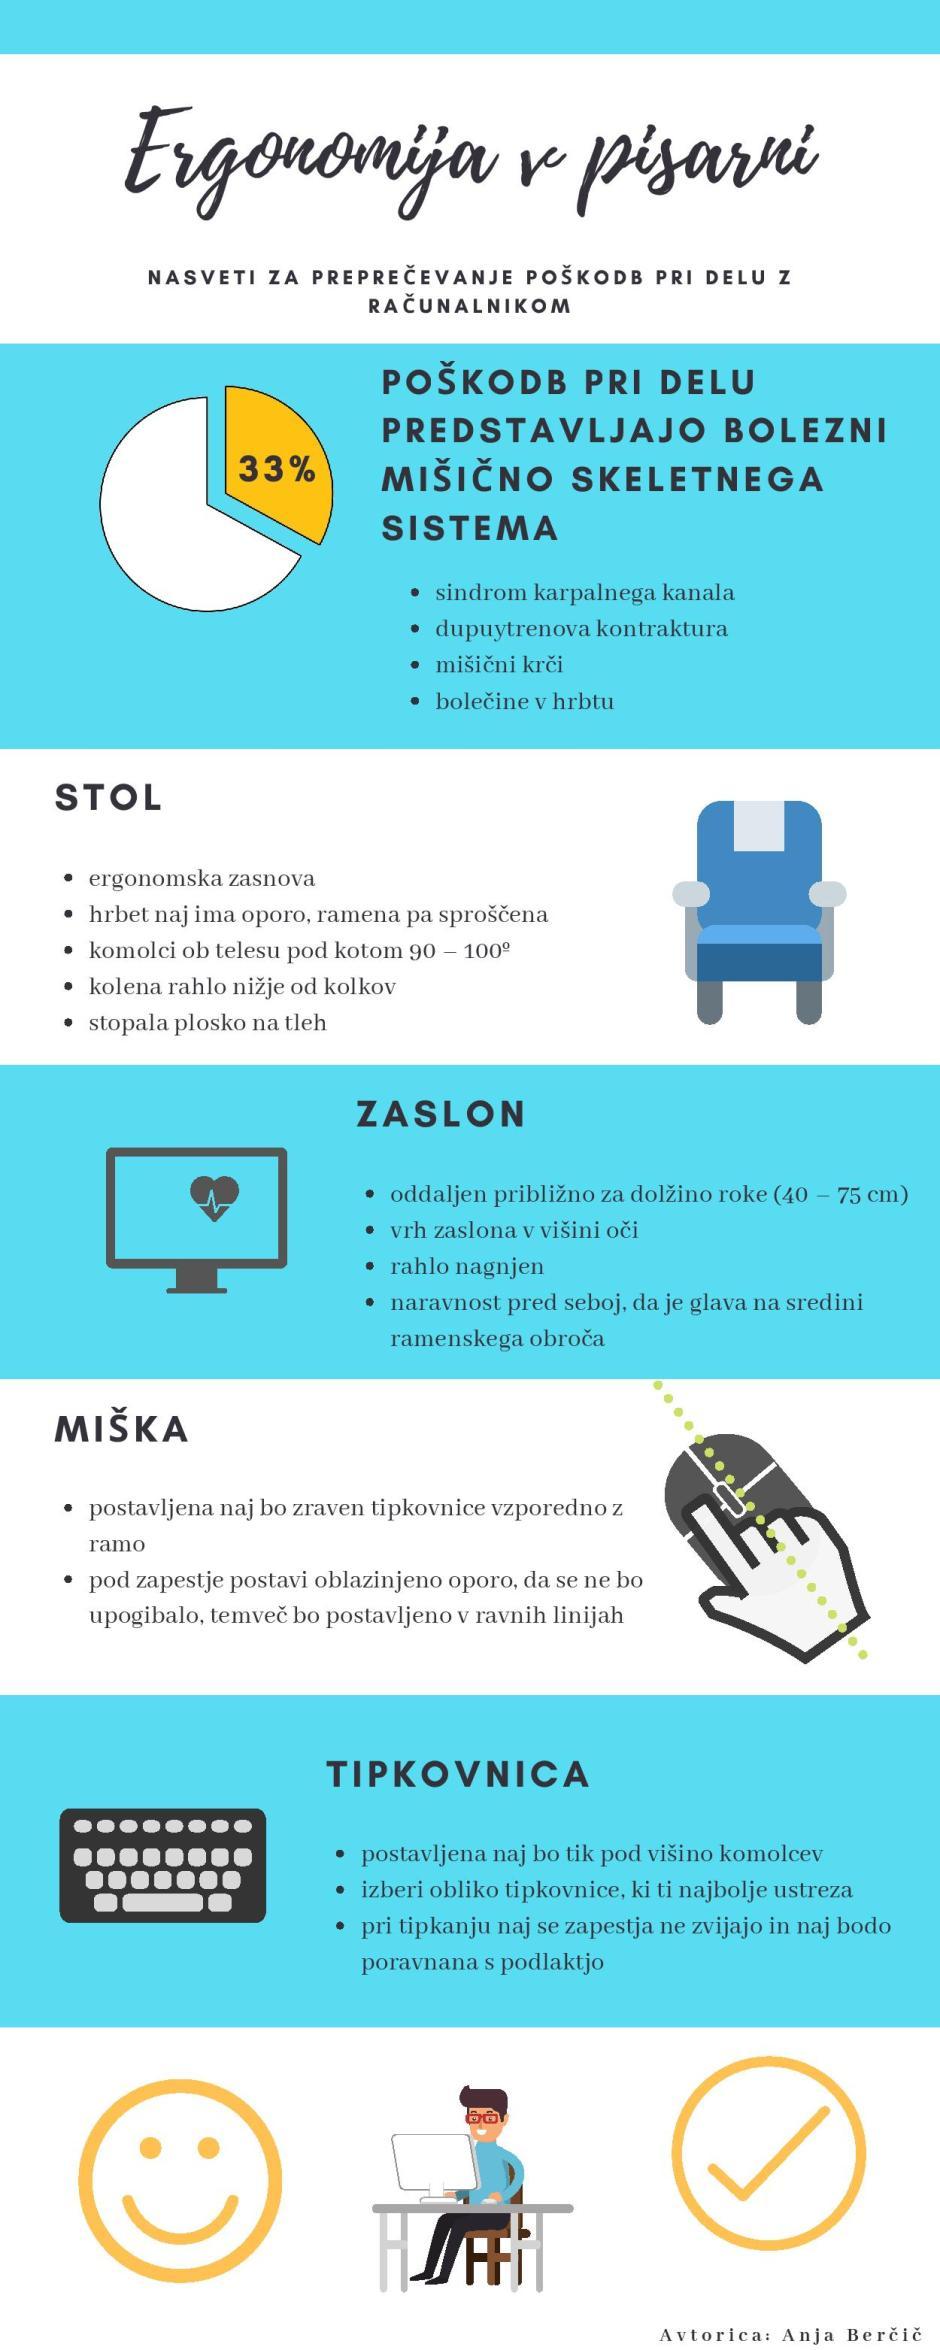 Ergonomija v pisarni_infografika_Berčič-page-001.jpg